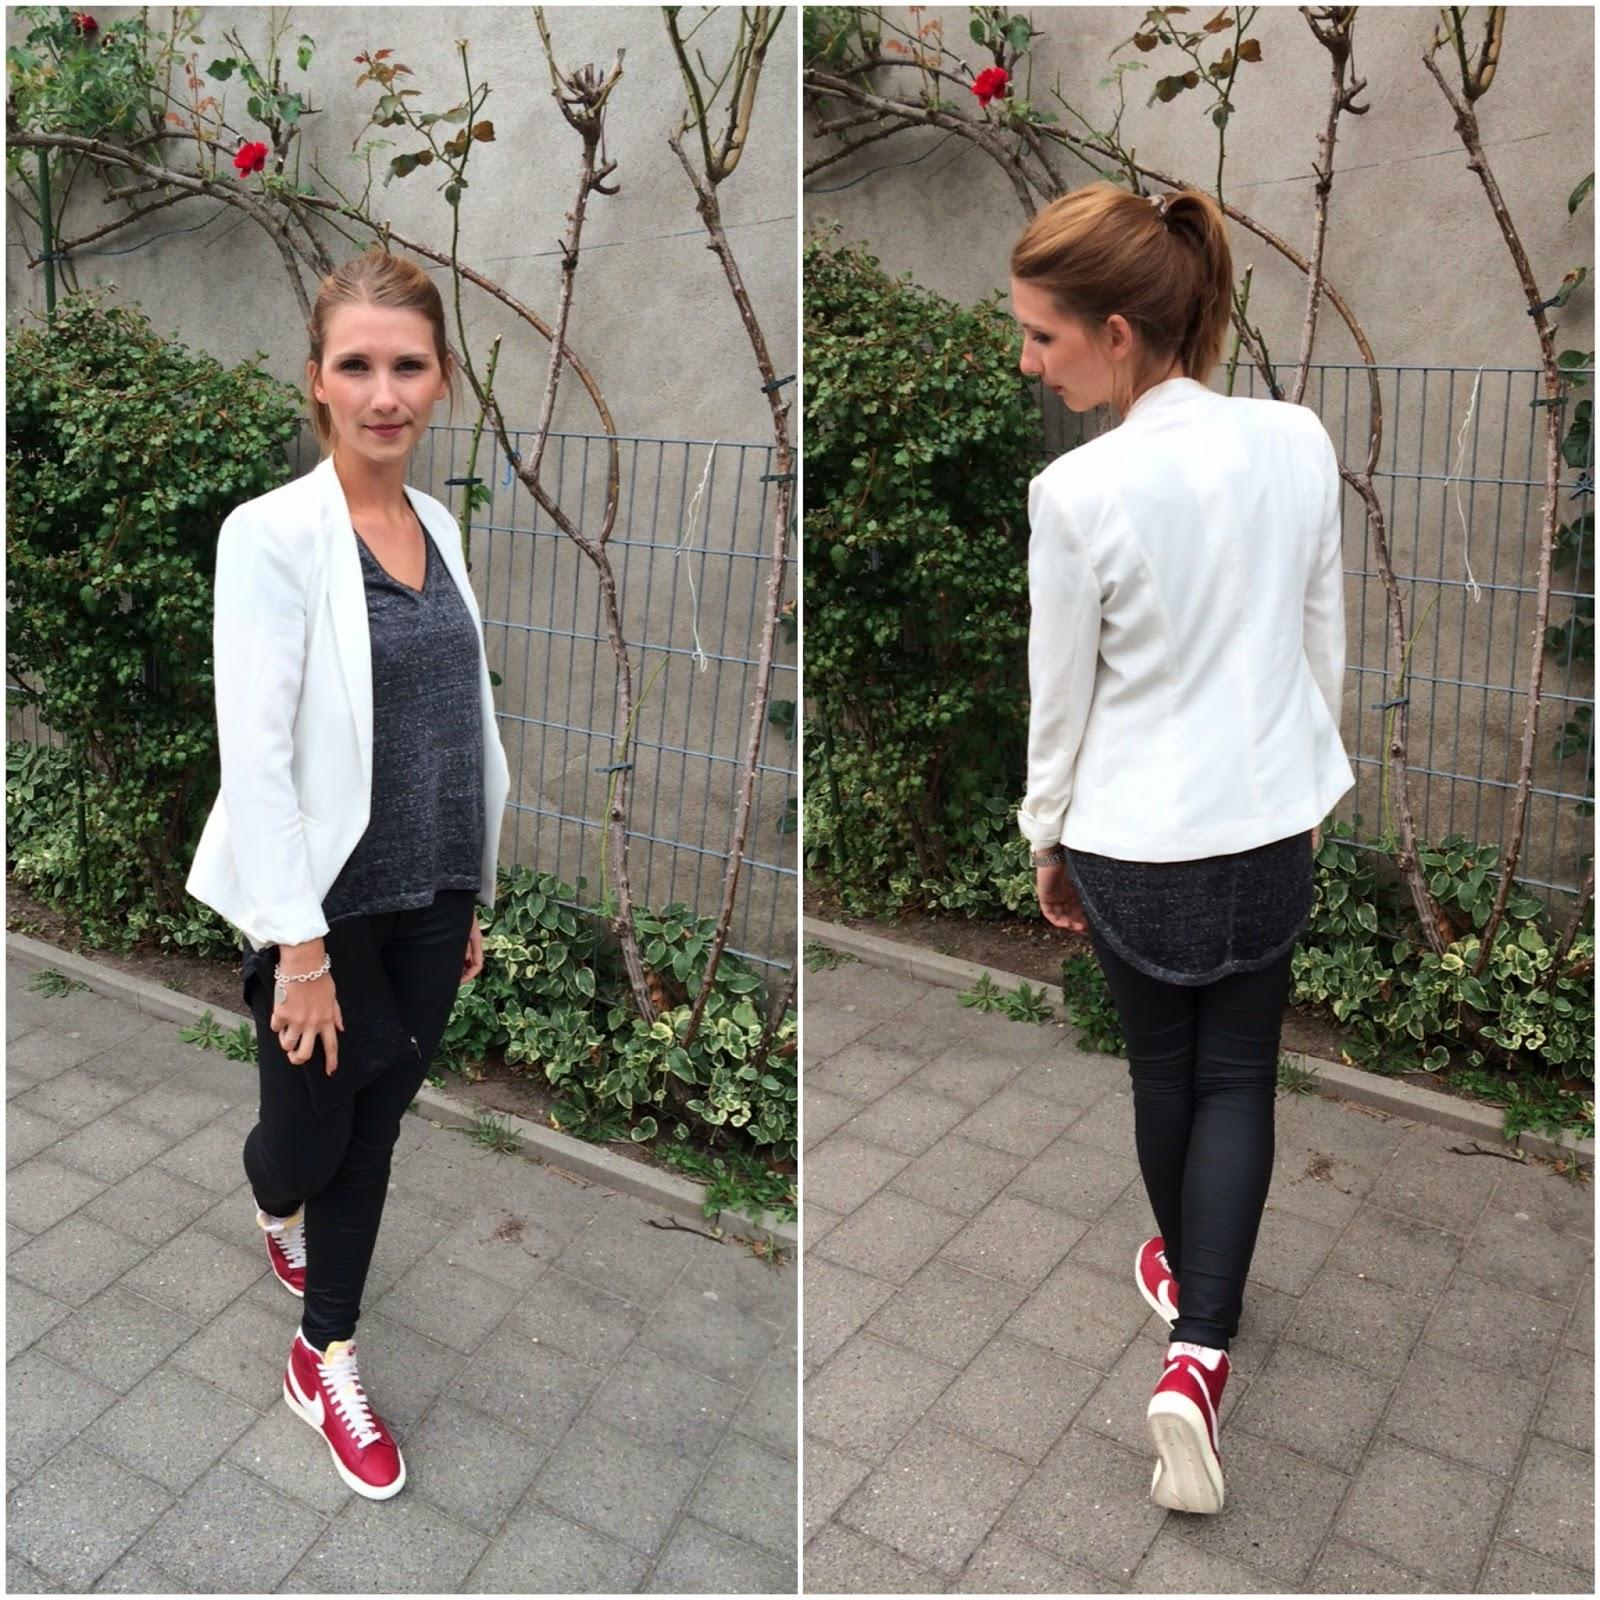 online retailer 8e90d 0777a Blazer Mango - T-Shirt HM - Hose Hallhuber - Schuhe Nike